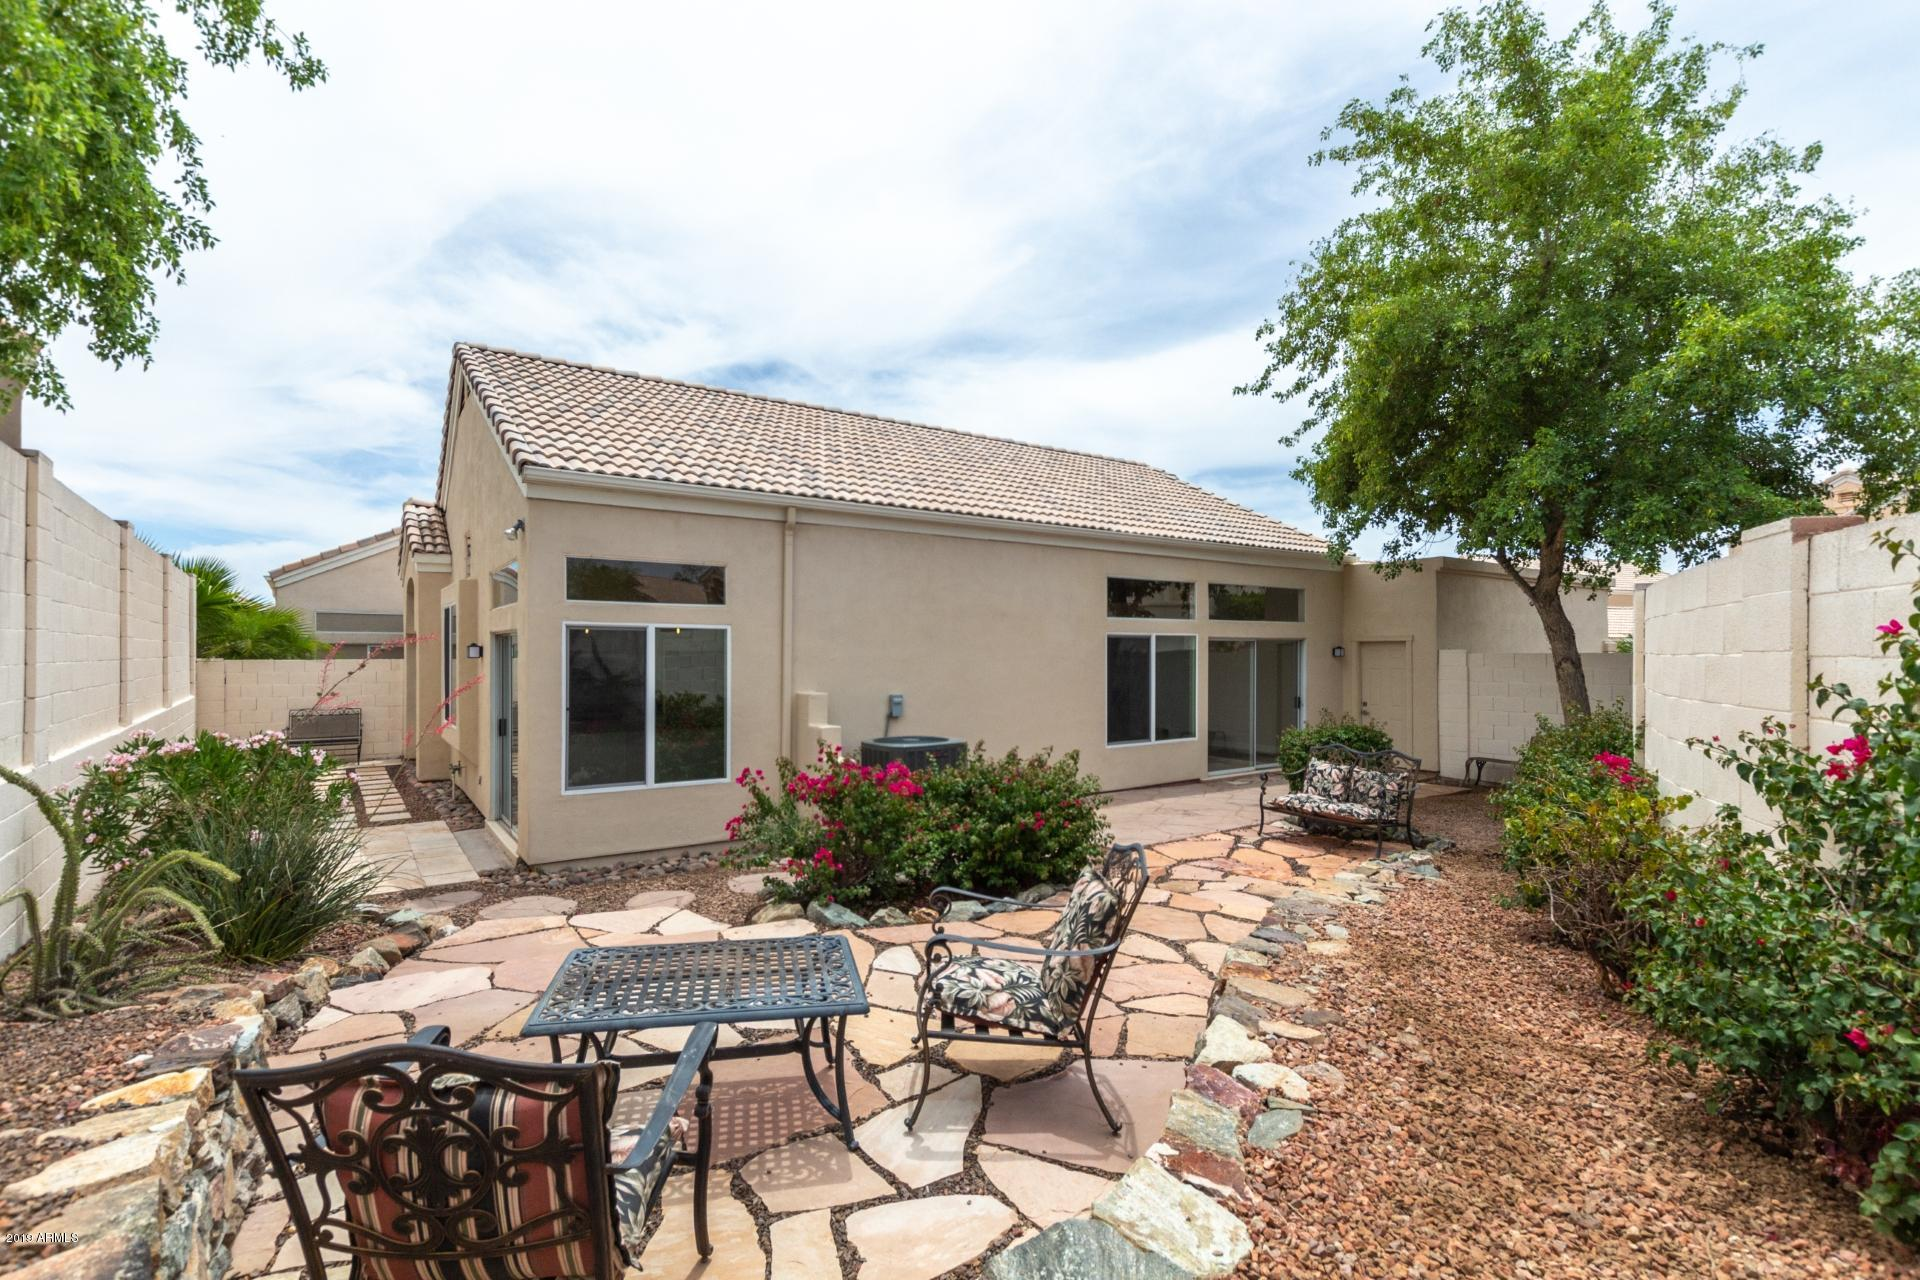 MLS 5927047 15871 S 11TH Place, Phoenix, AZ 85048 Ahwatukee Community AZ Condo or Townhome